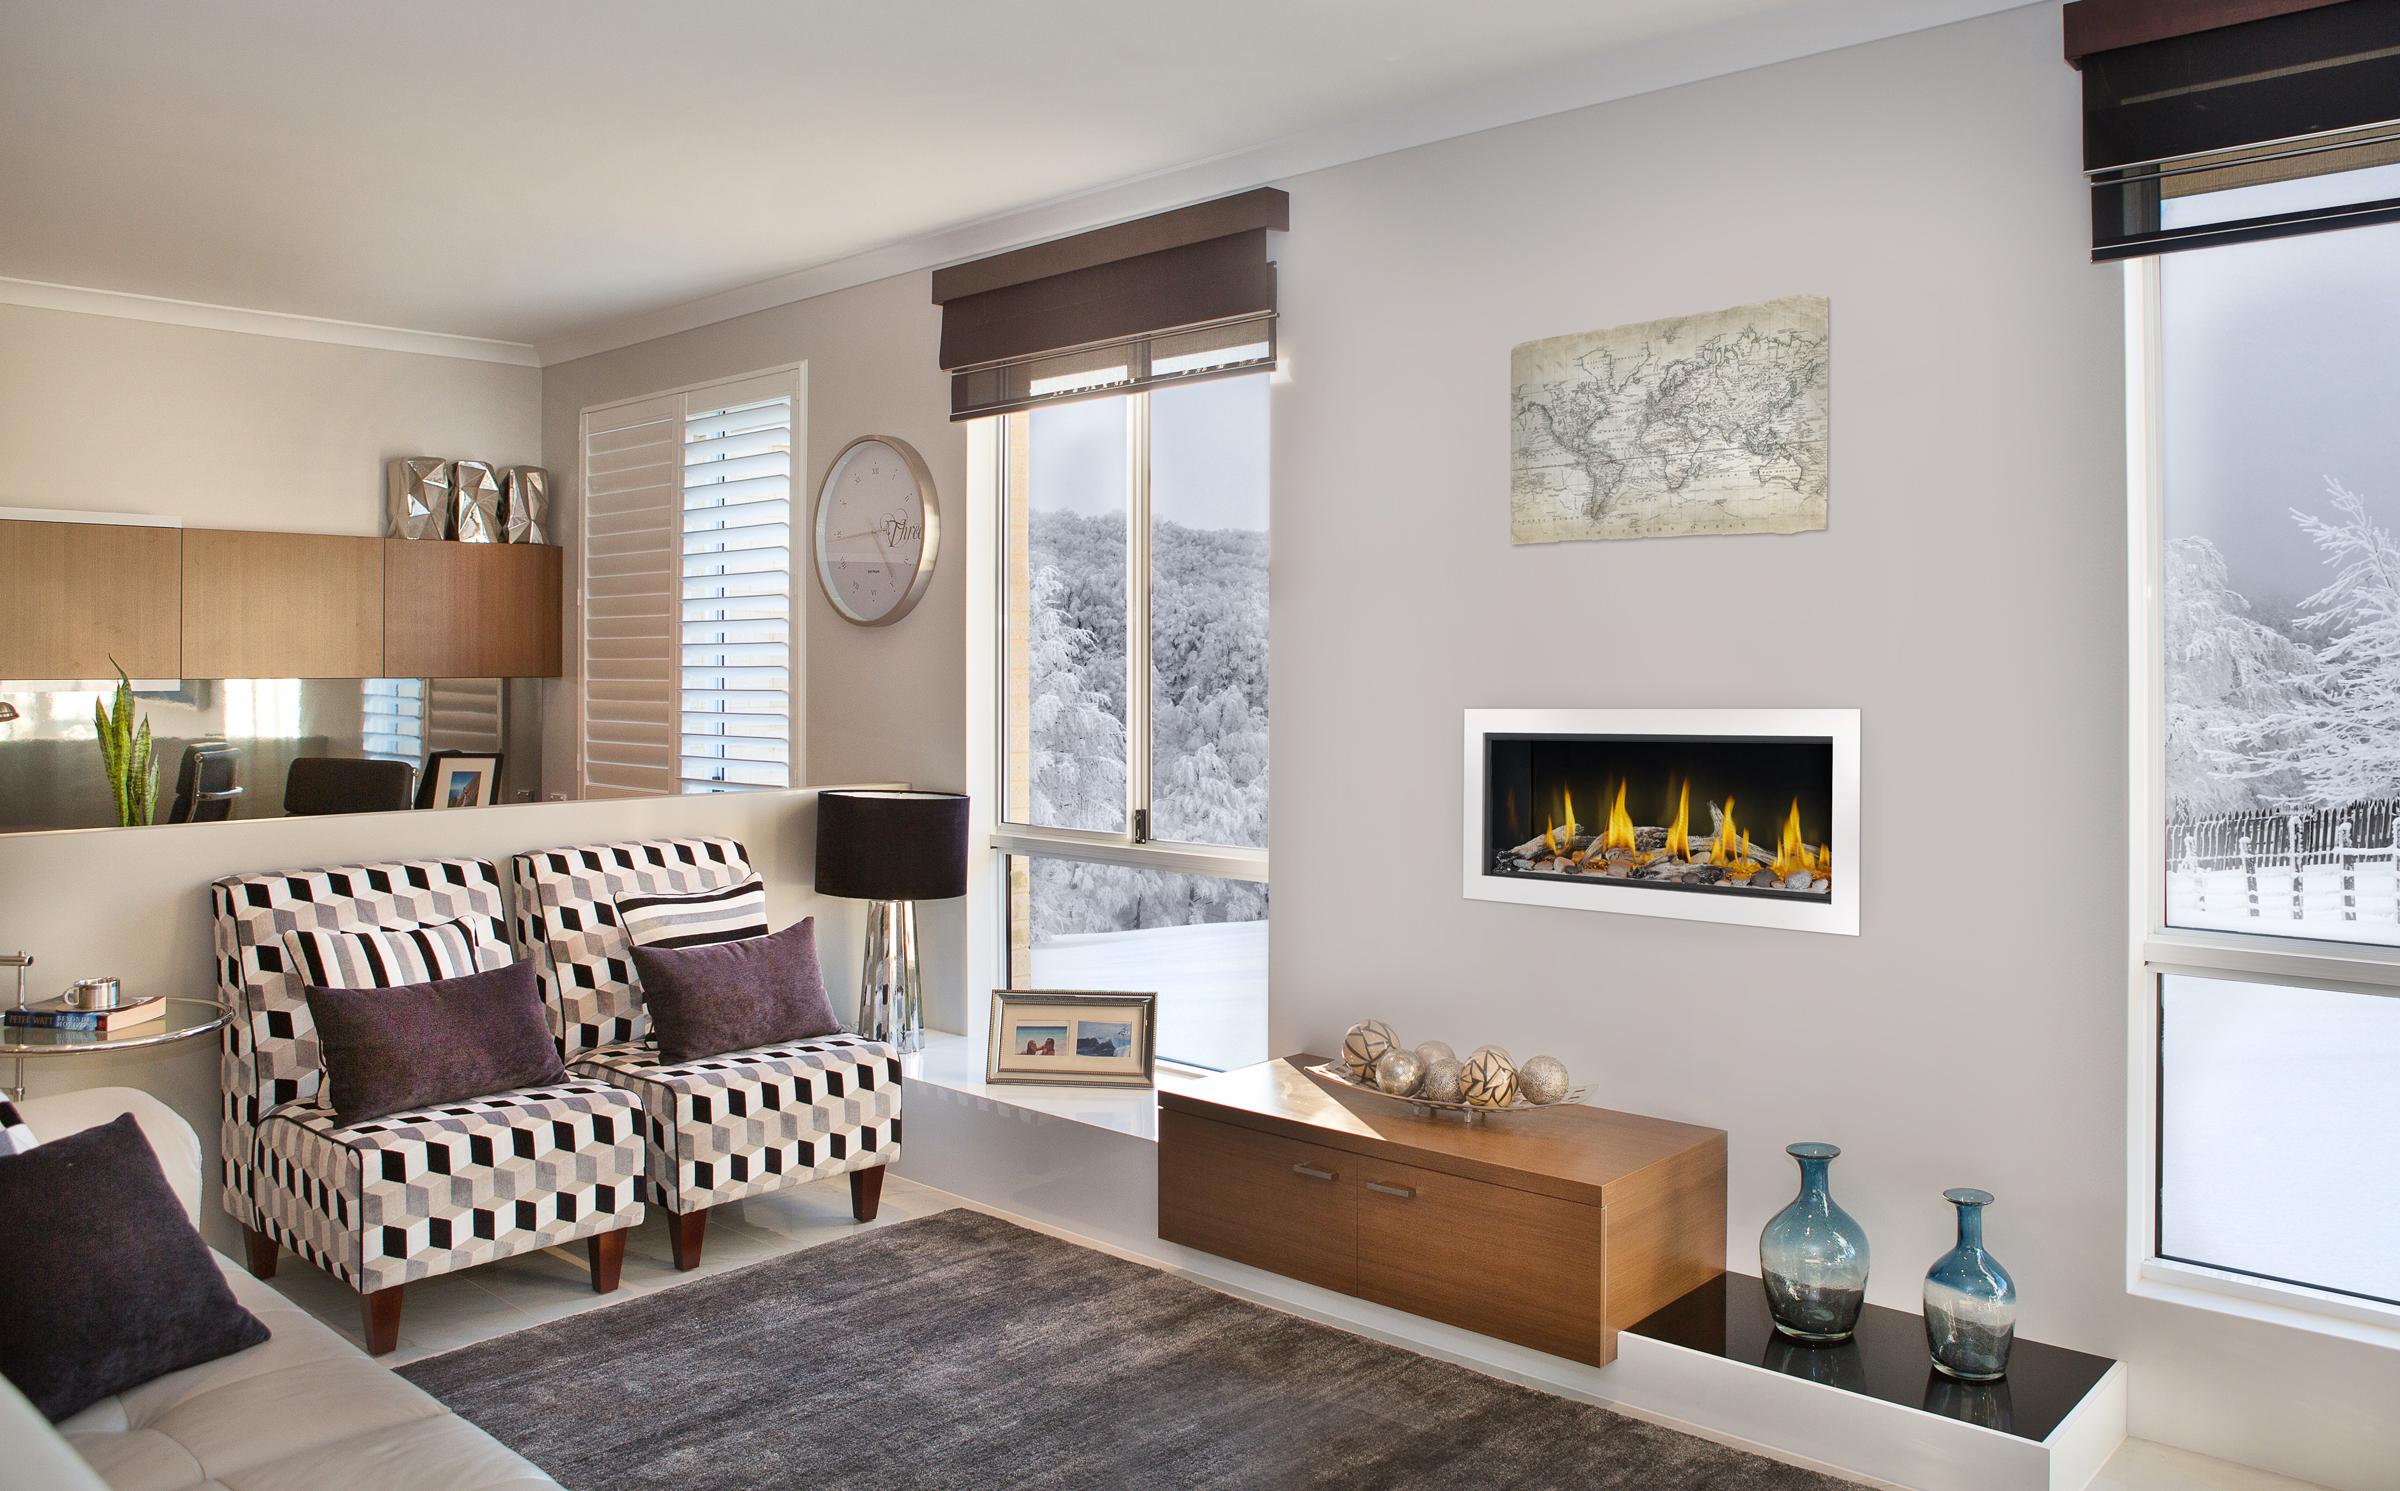 vector-lv38-livingroom-dle-rek-mke-white-surround-napoleon-fireplaces.jpg